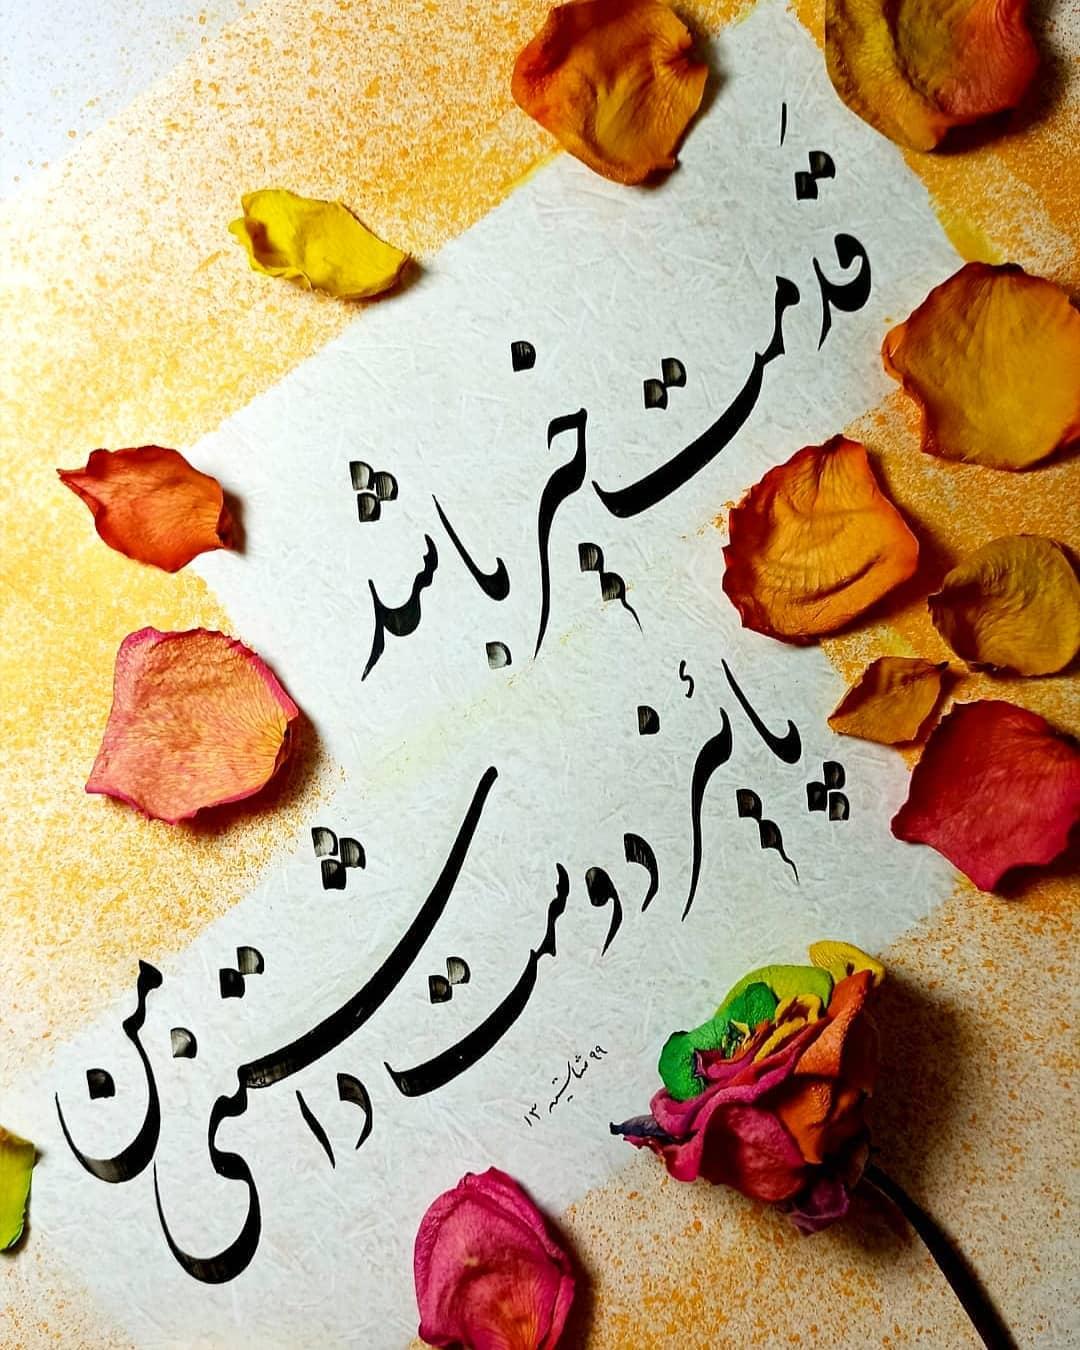 Farisi/Nasta'liq khatestan  ﷽ قدمت خیر باشد، پاییز دوست داشتنی من . #خطستان  @khatestan #خط_خودکاری#خط_خودک… 865